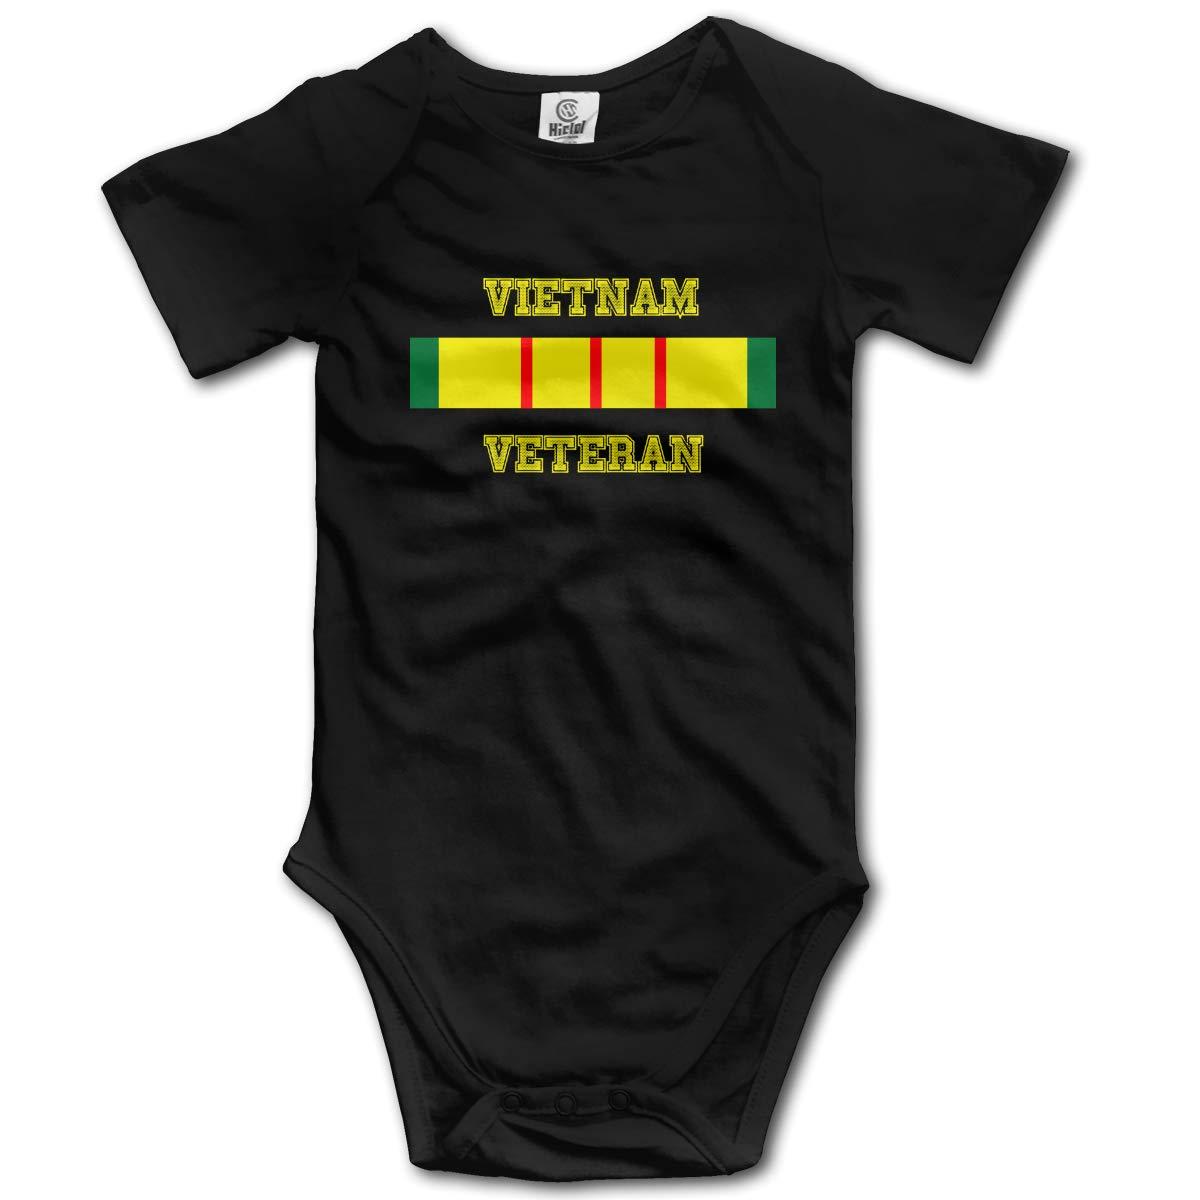 Vietnam Veteran United States Army Military Boys /& Girls Black Short Sleeve Romper Bodysuits for 0-24 Months